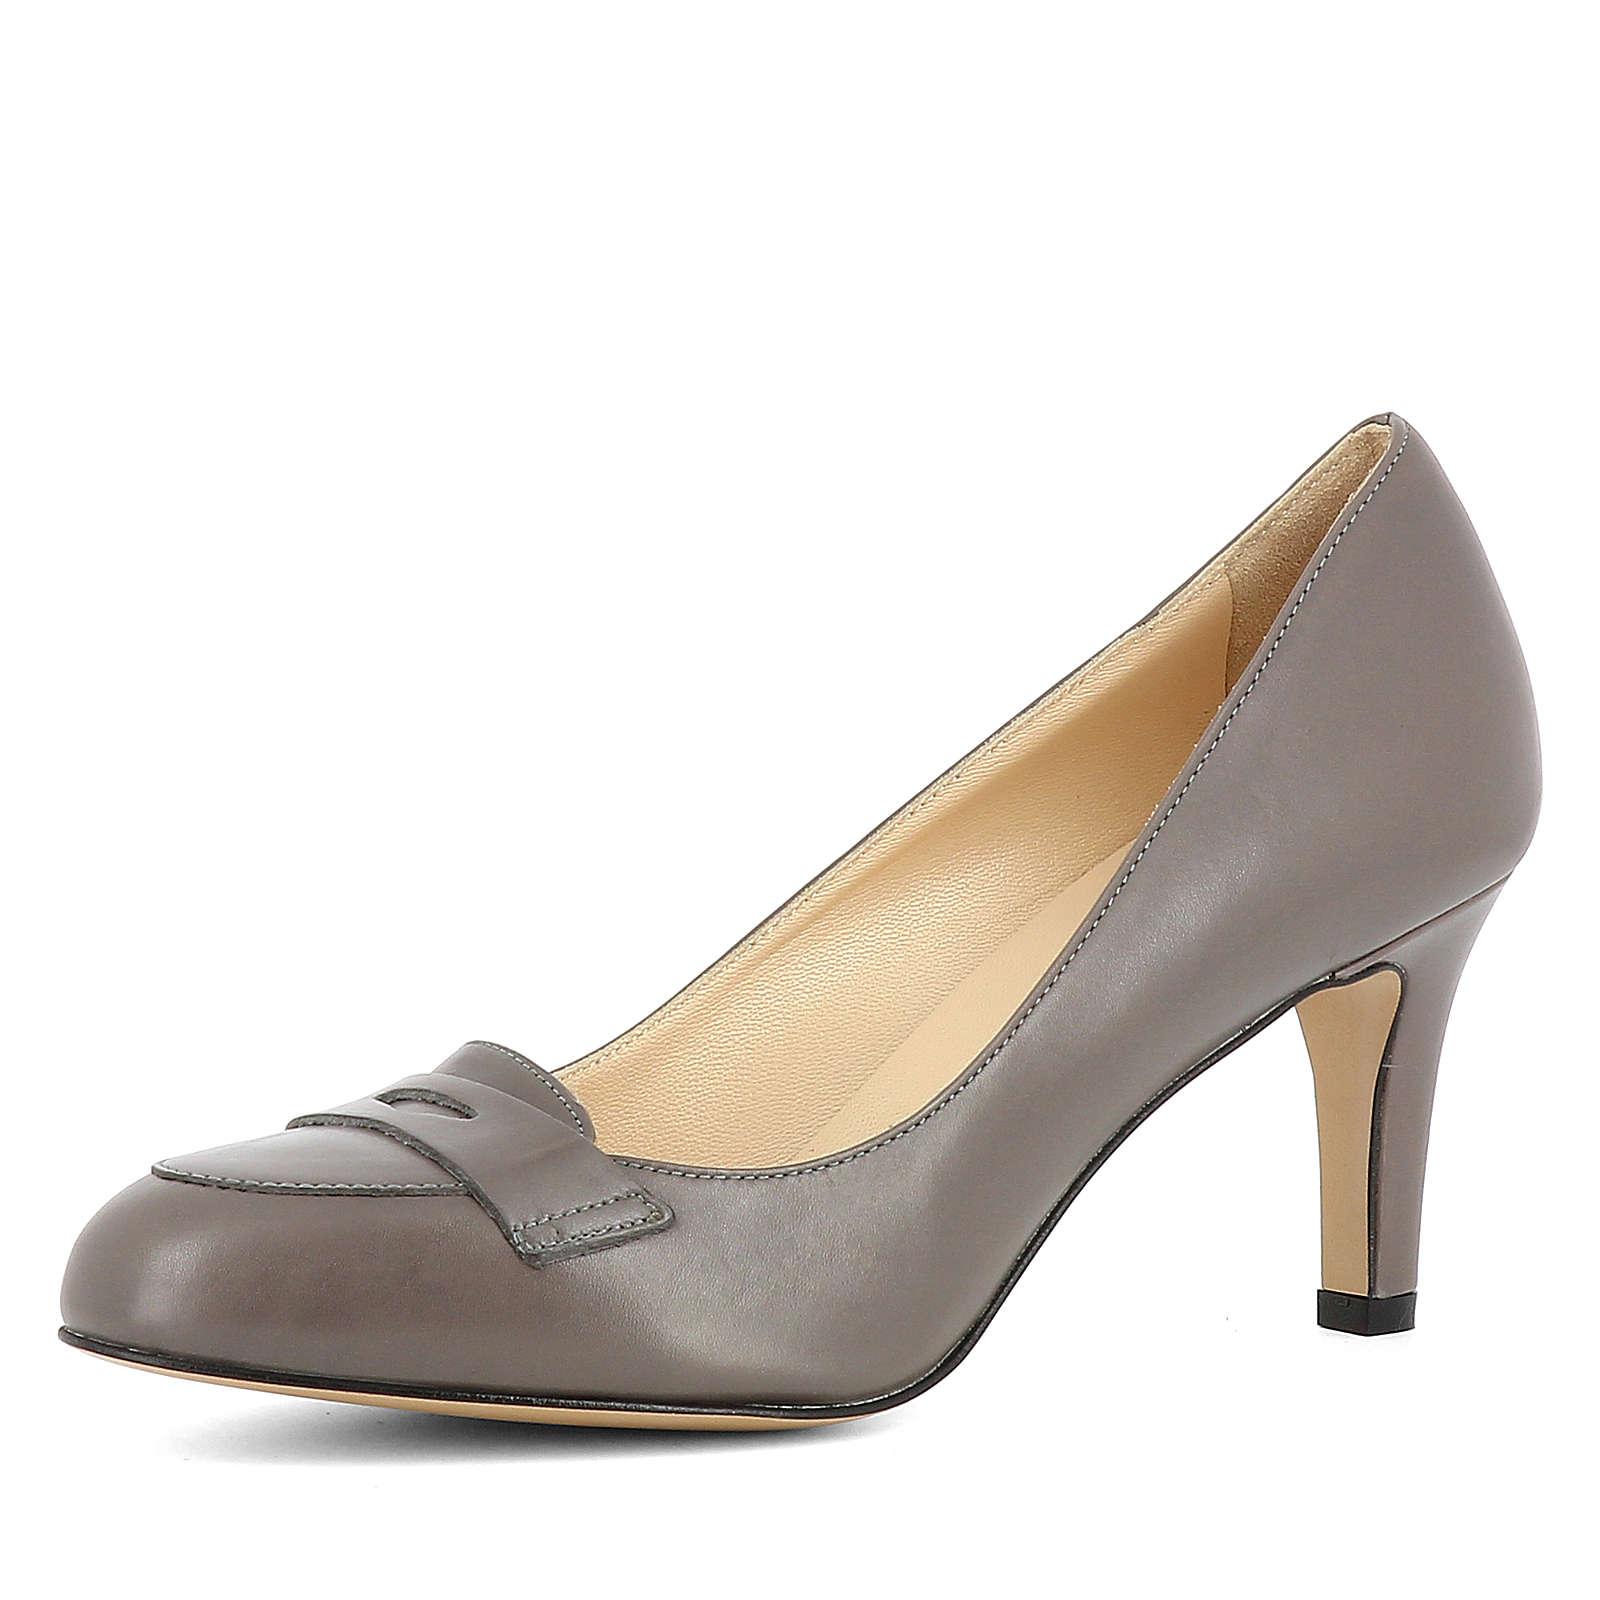 Evita Shoes BIANCA Loafer-Pumps grau Damen Gr. 36